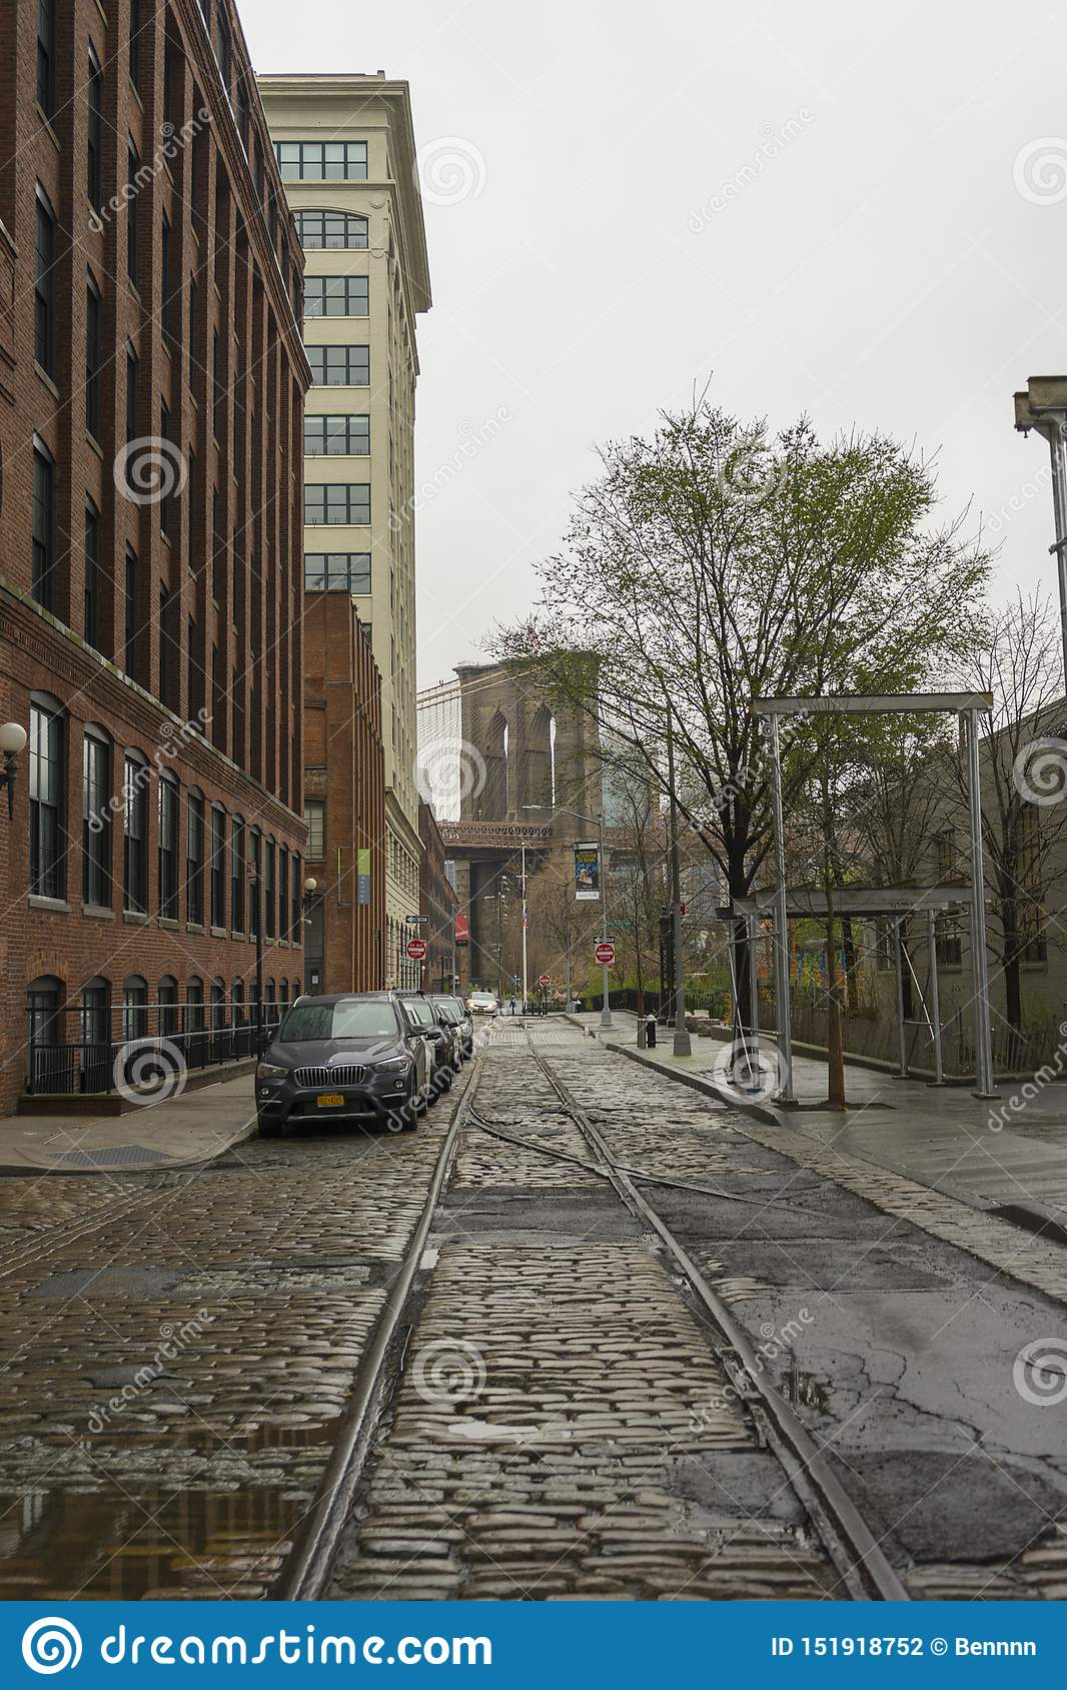 Street view of DUMBO Neighbourhood in Brooklyn in New York City ,USA